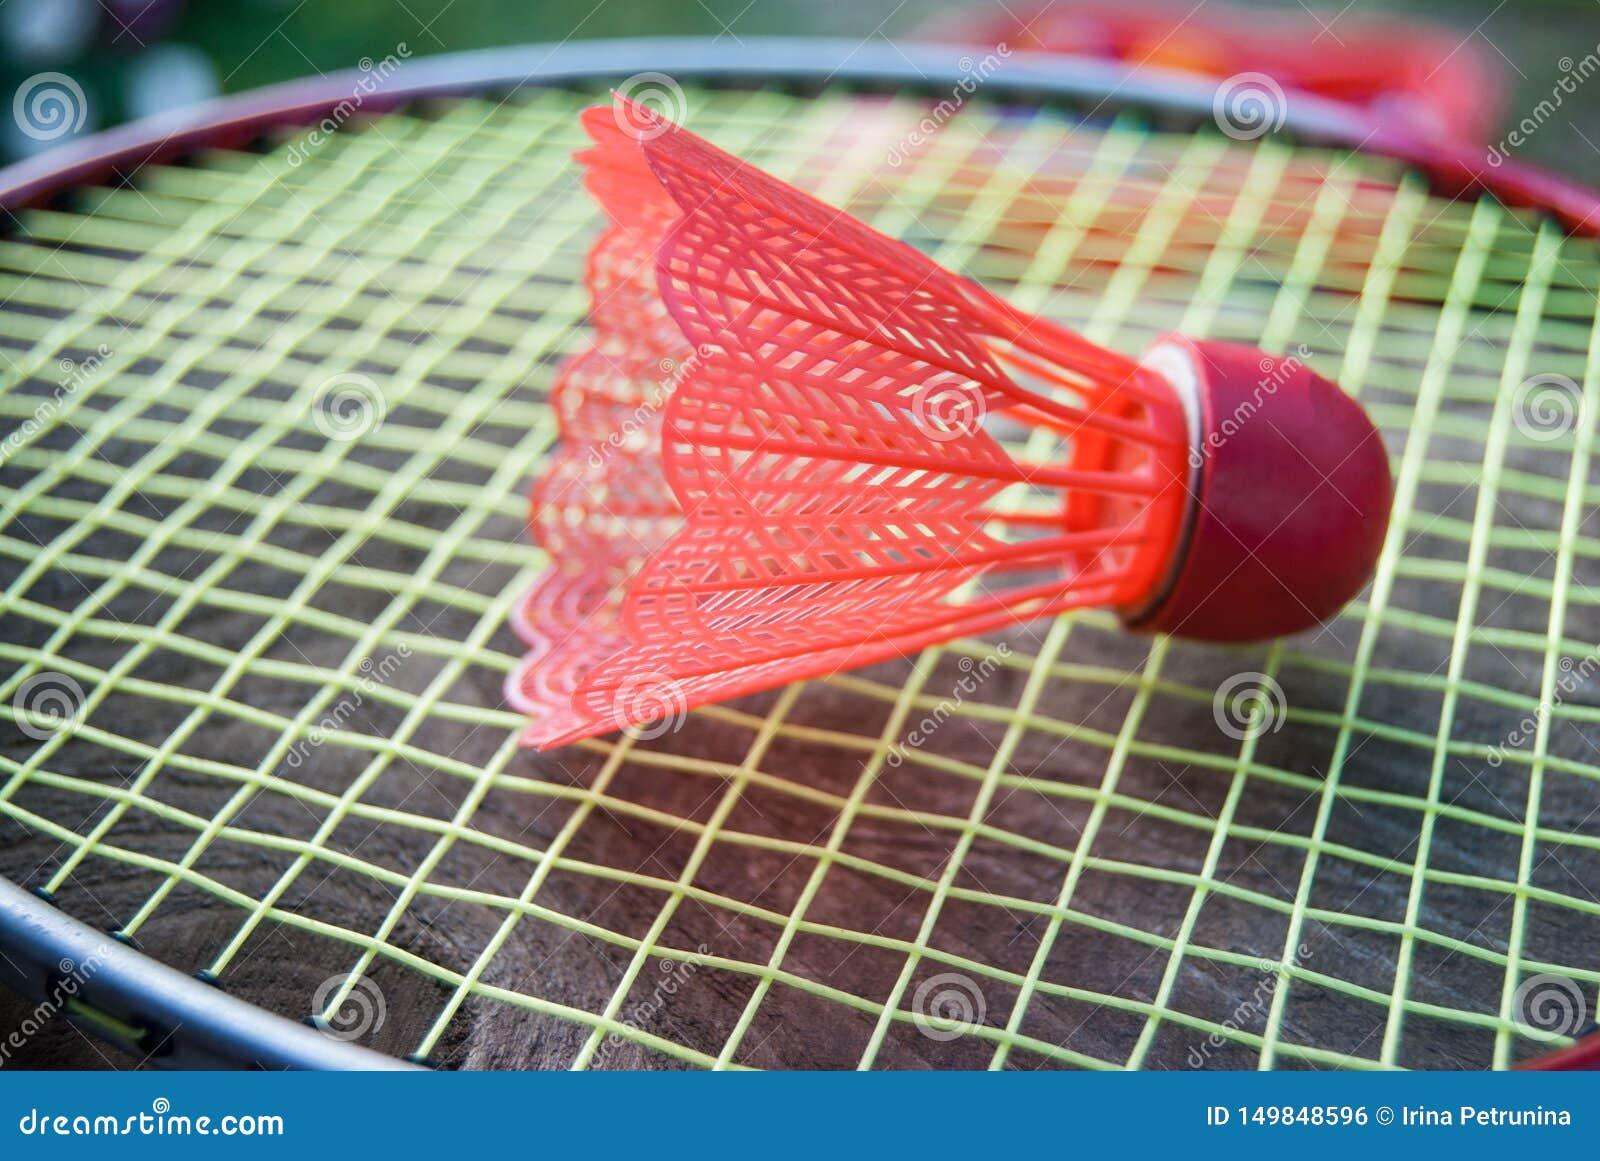 Roter Federball des Badminton